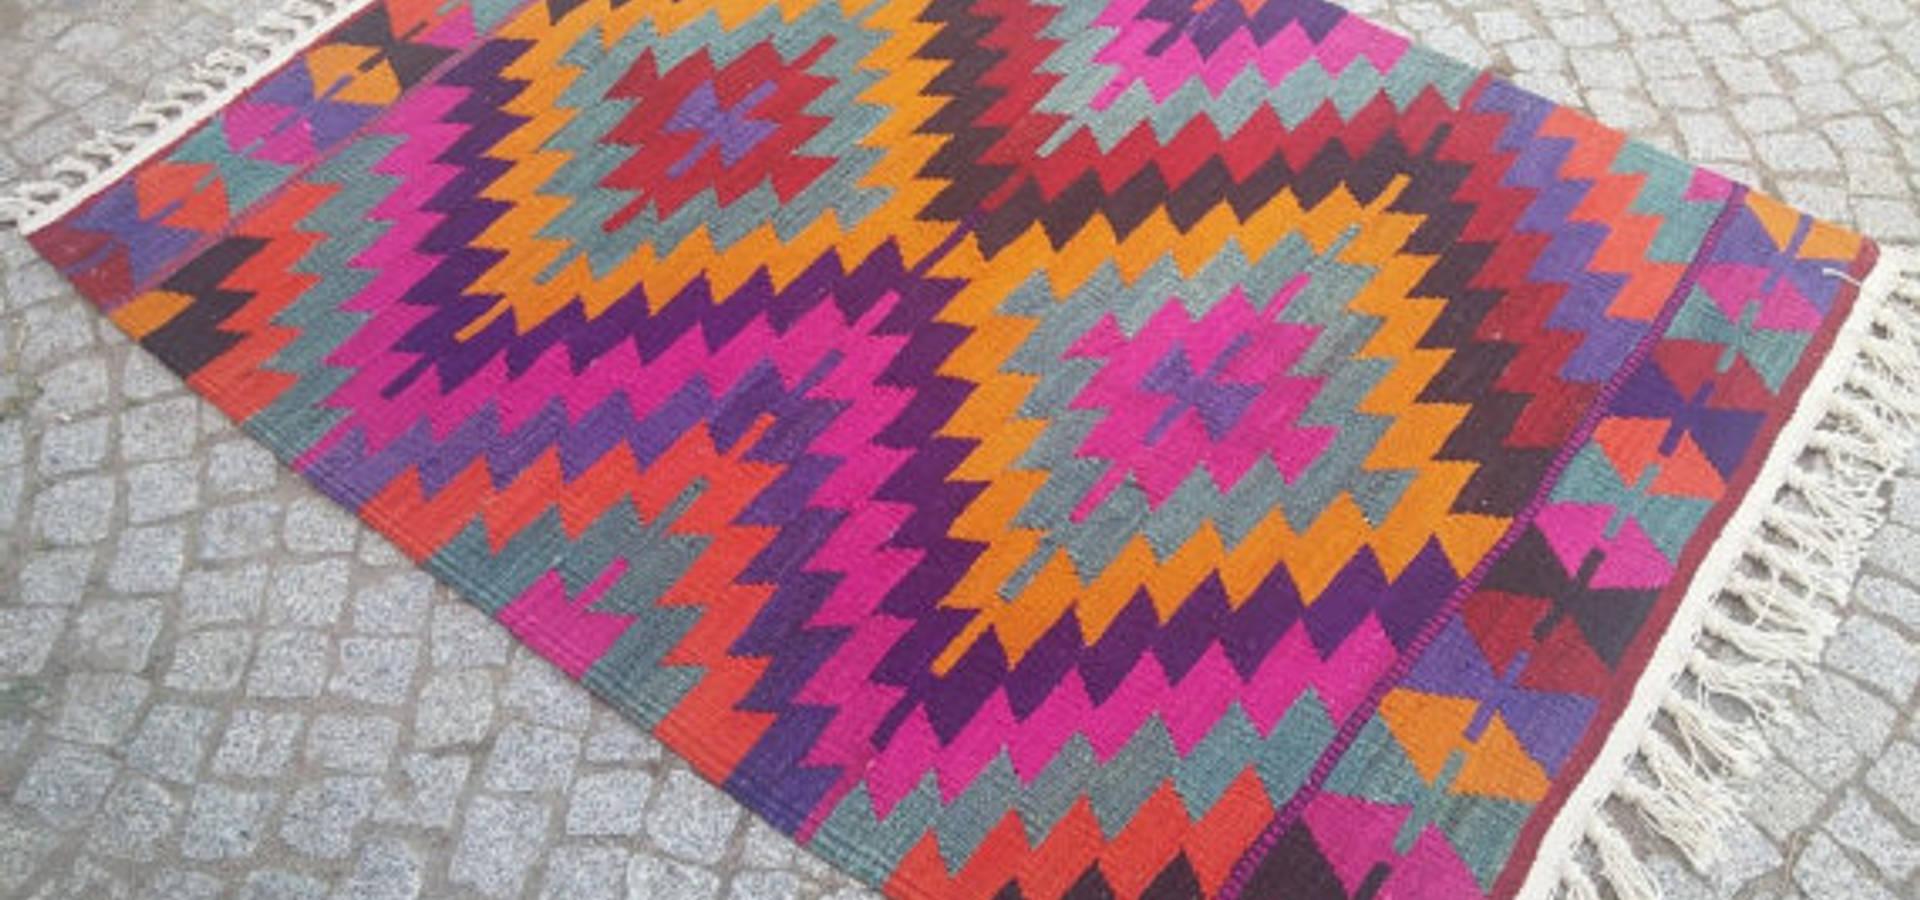 zafercarpet